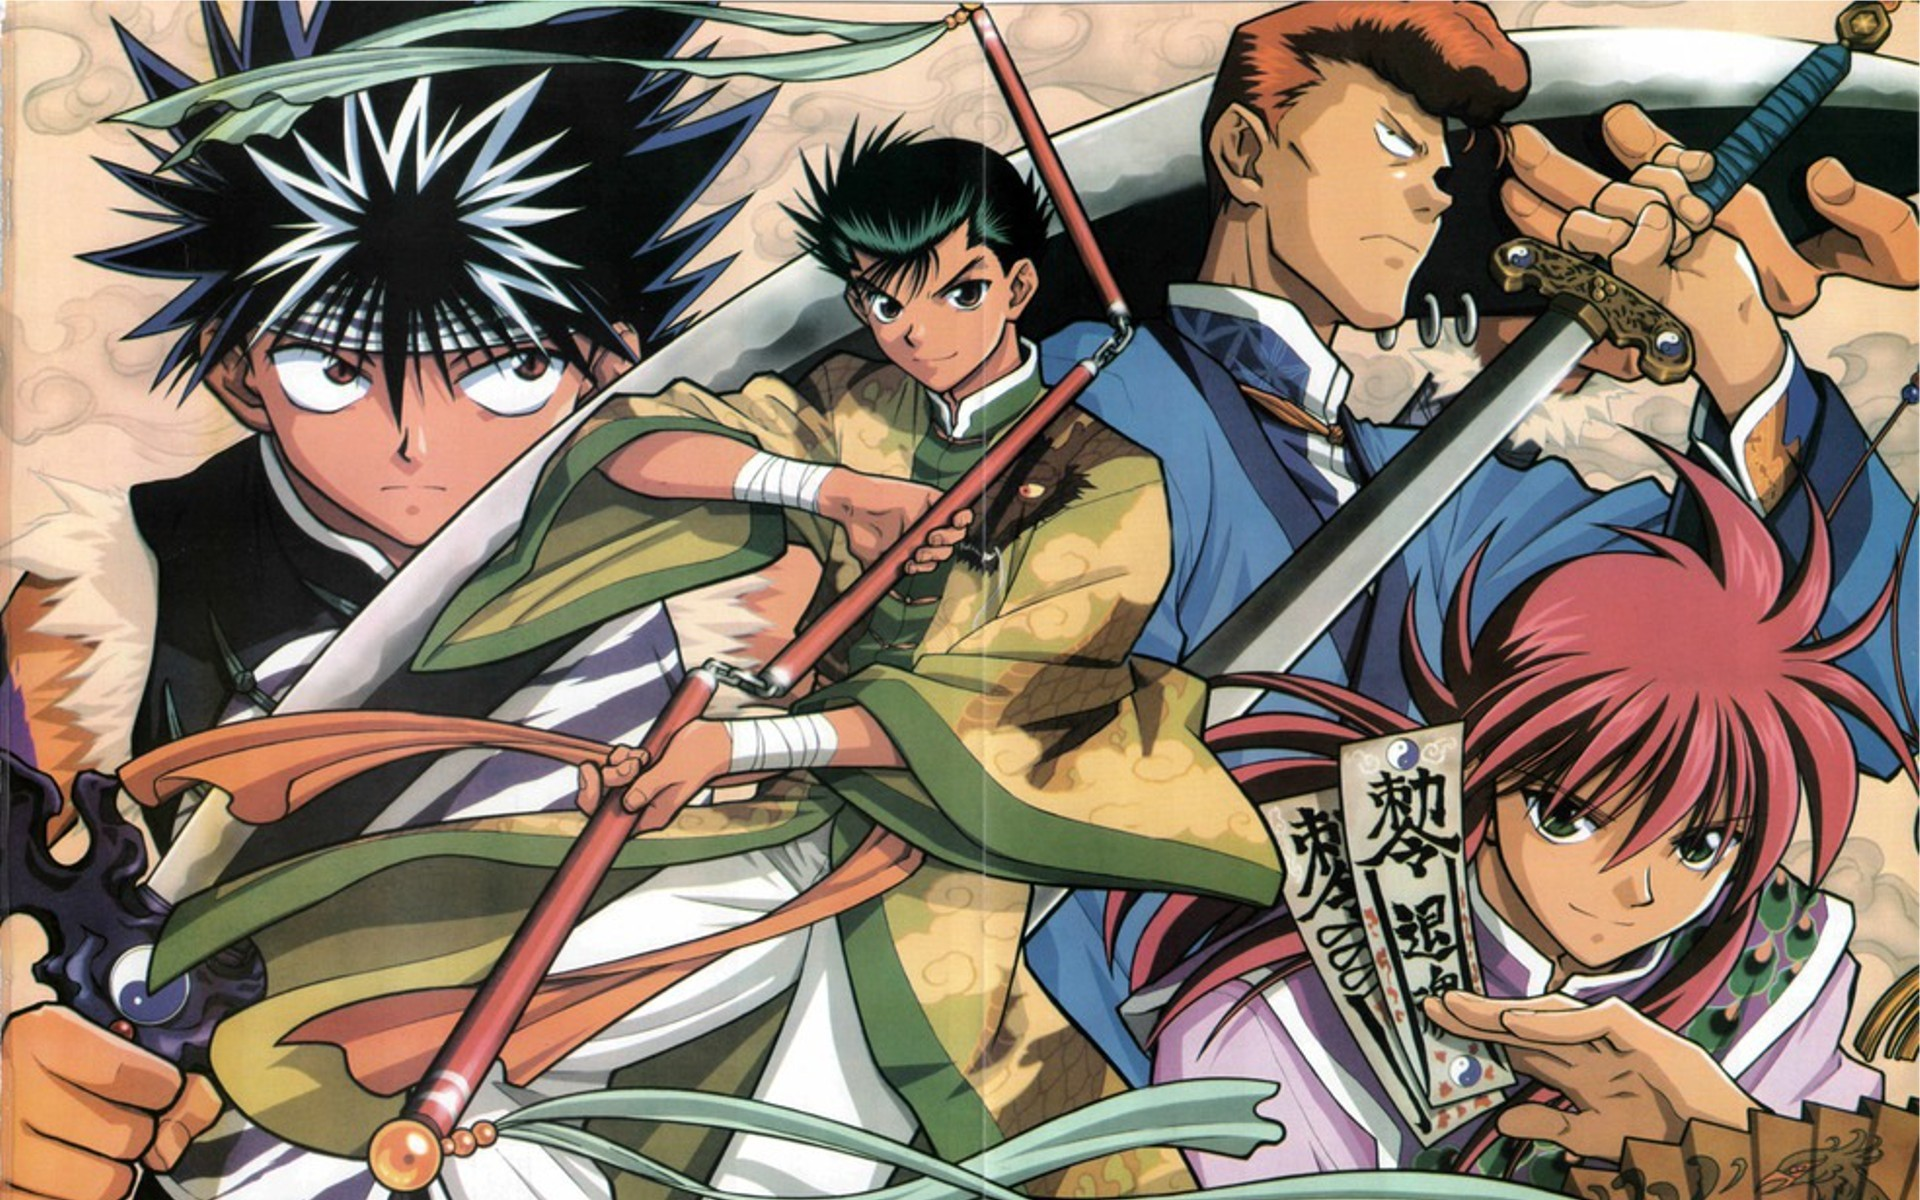 Yu Yu Hakusho Wallpaper Download Free High Resolution